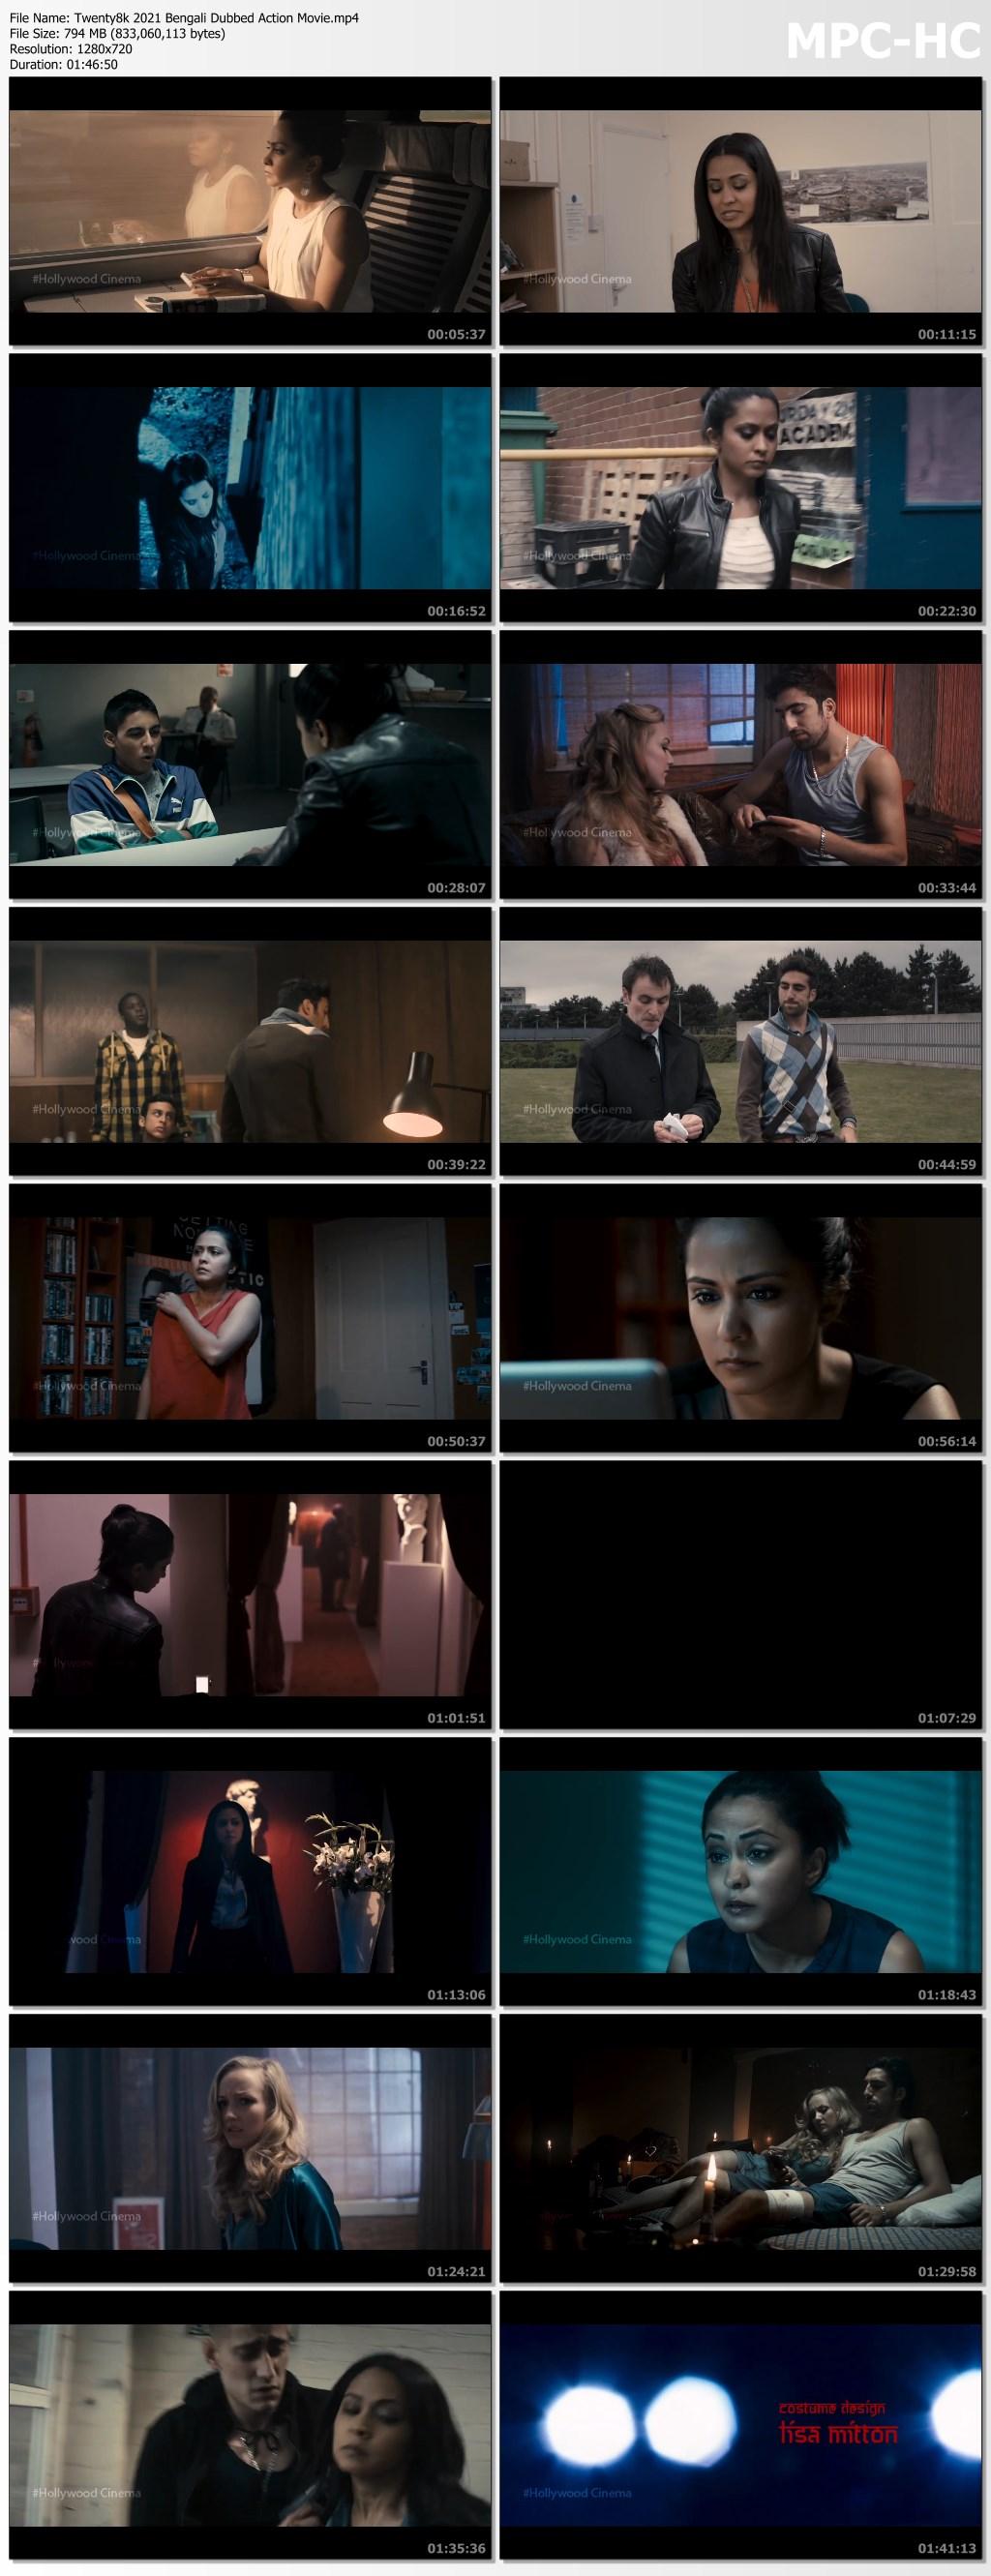 Twenty8k 2021 Bengali Dubbed Action Movie.mp4 thumbs